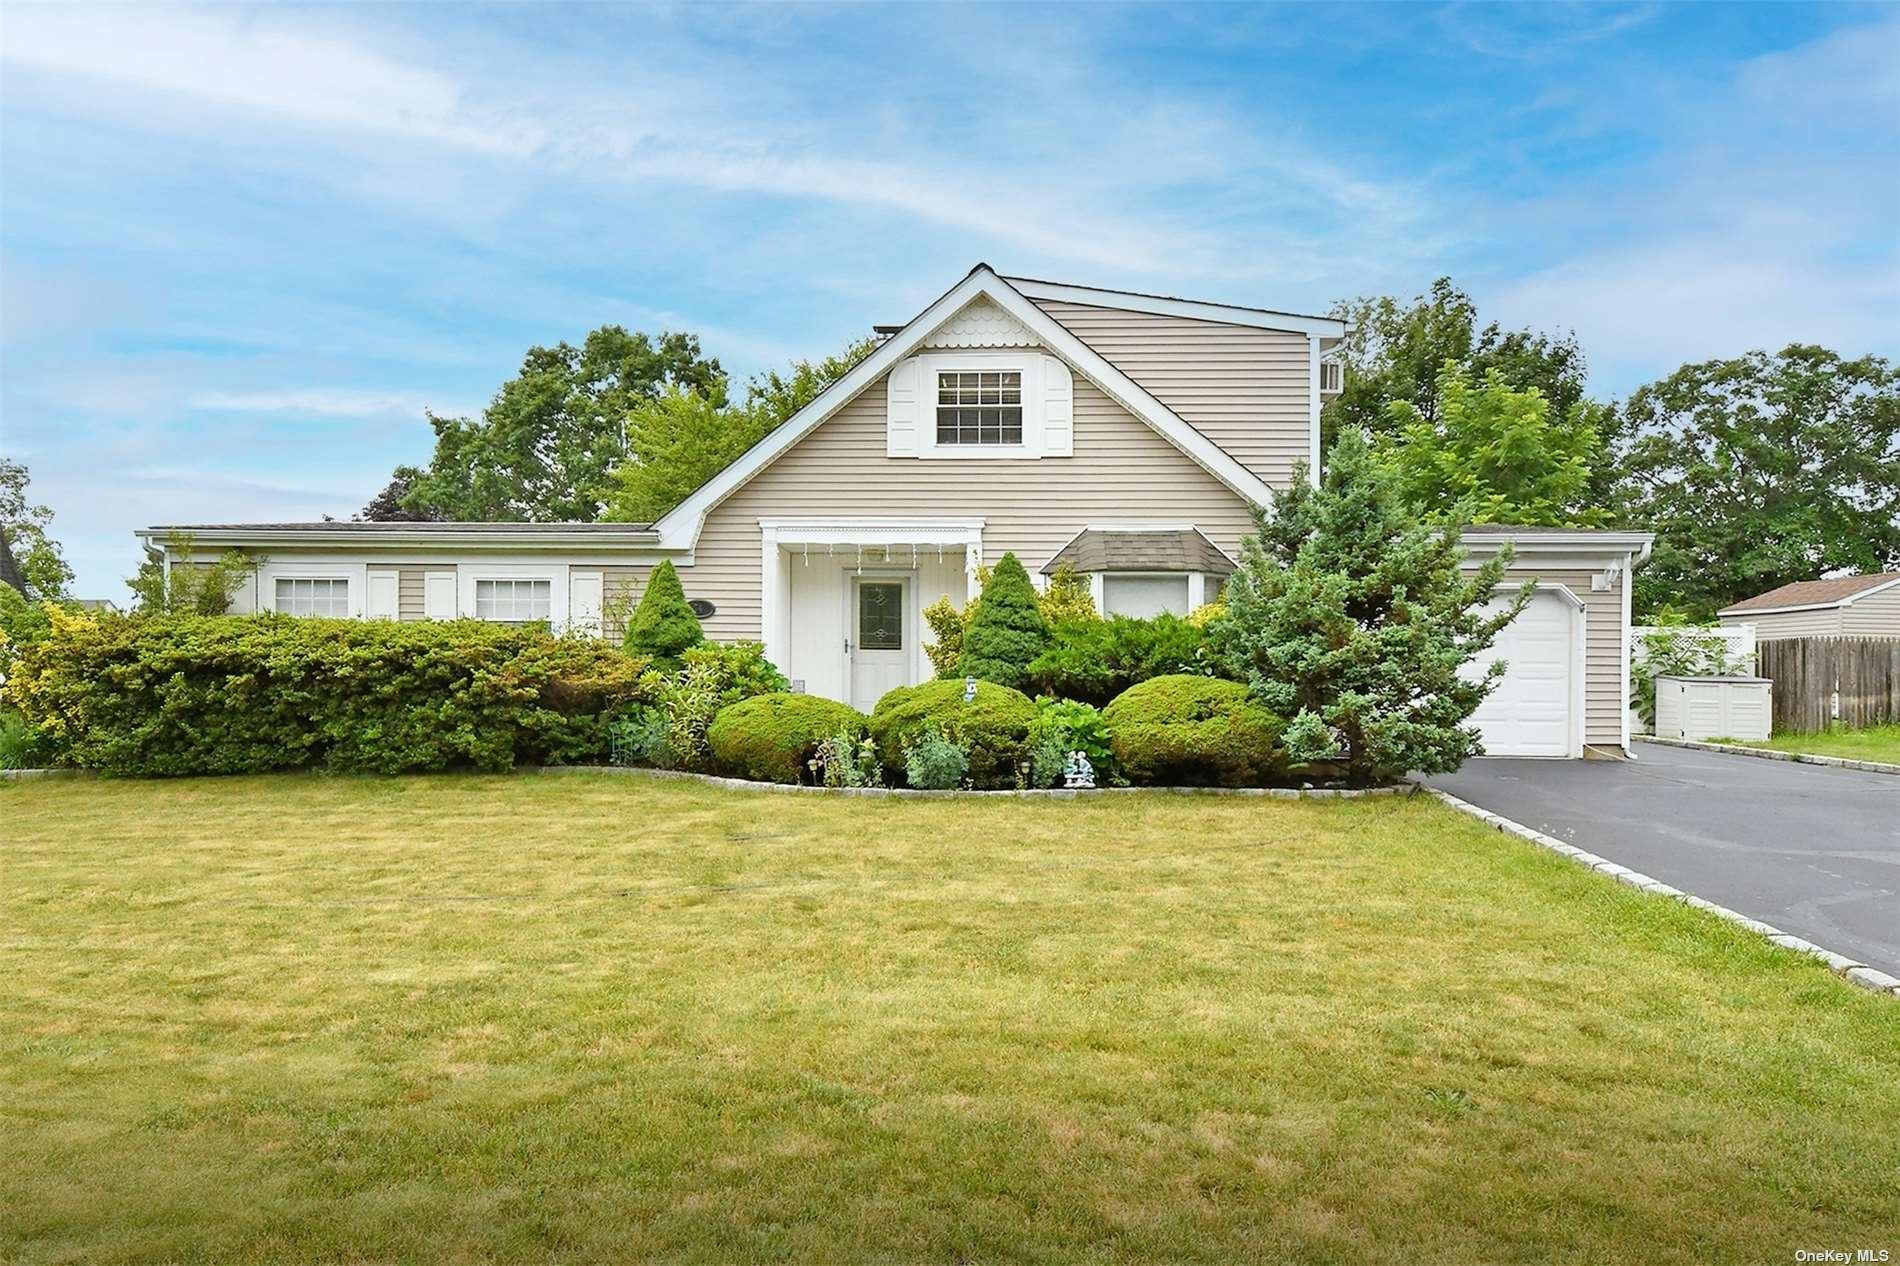 74 White Pine Way, Medford, NY 11763 - MLS#: 3328984